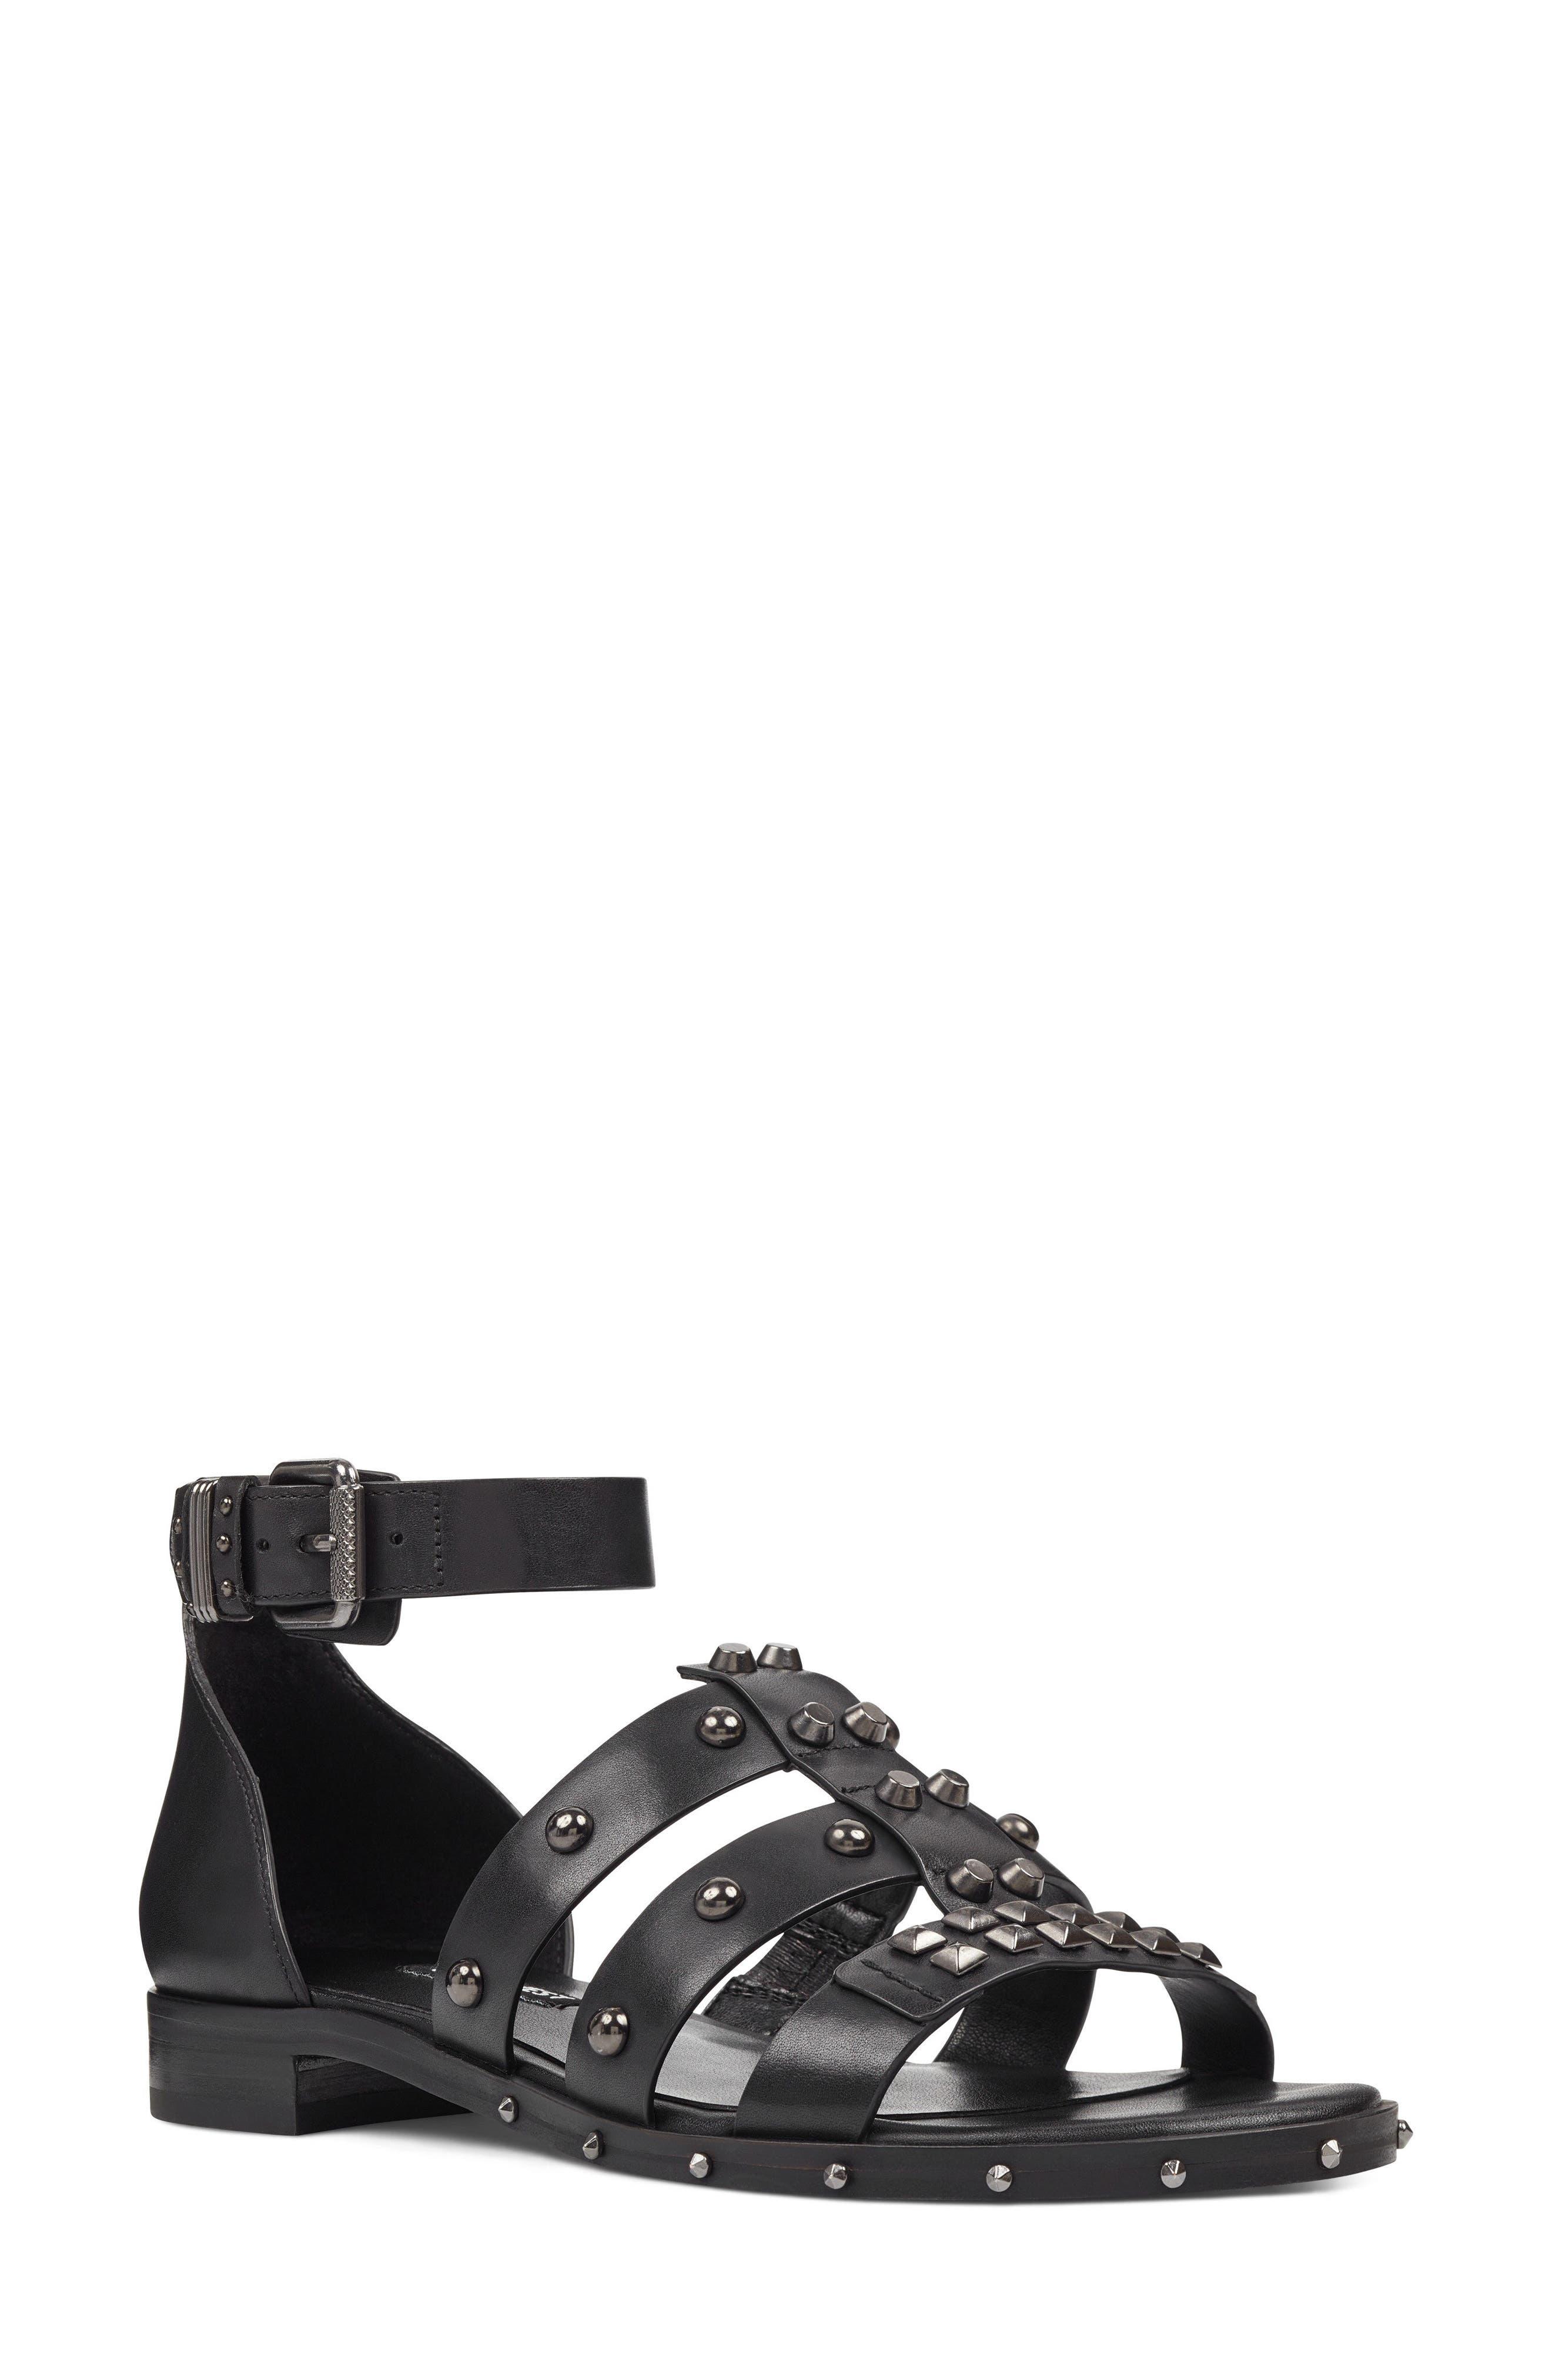 Corisande Sandal,                         Main,                         color, BLACK LEATHER